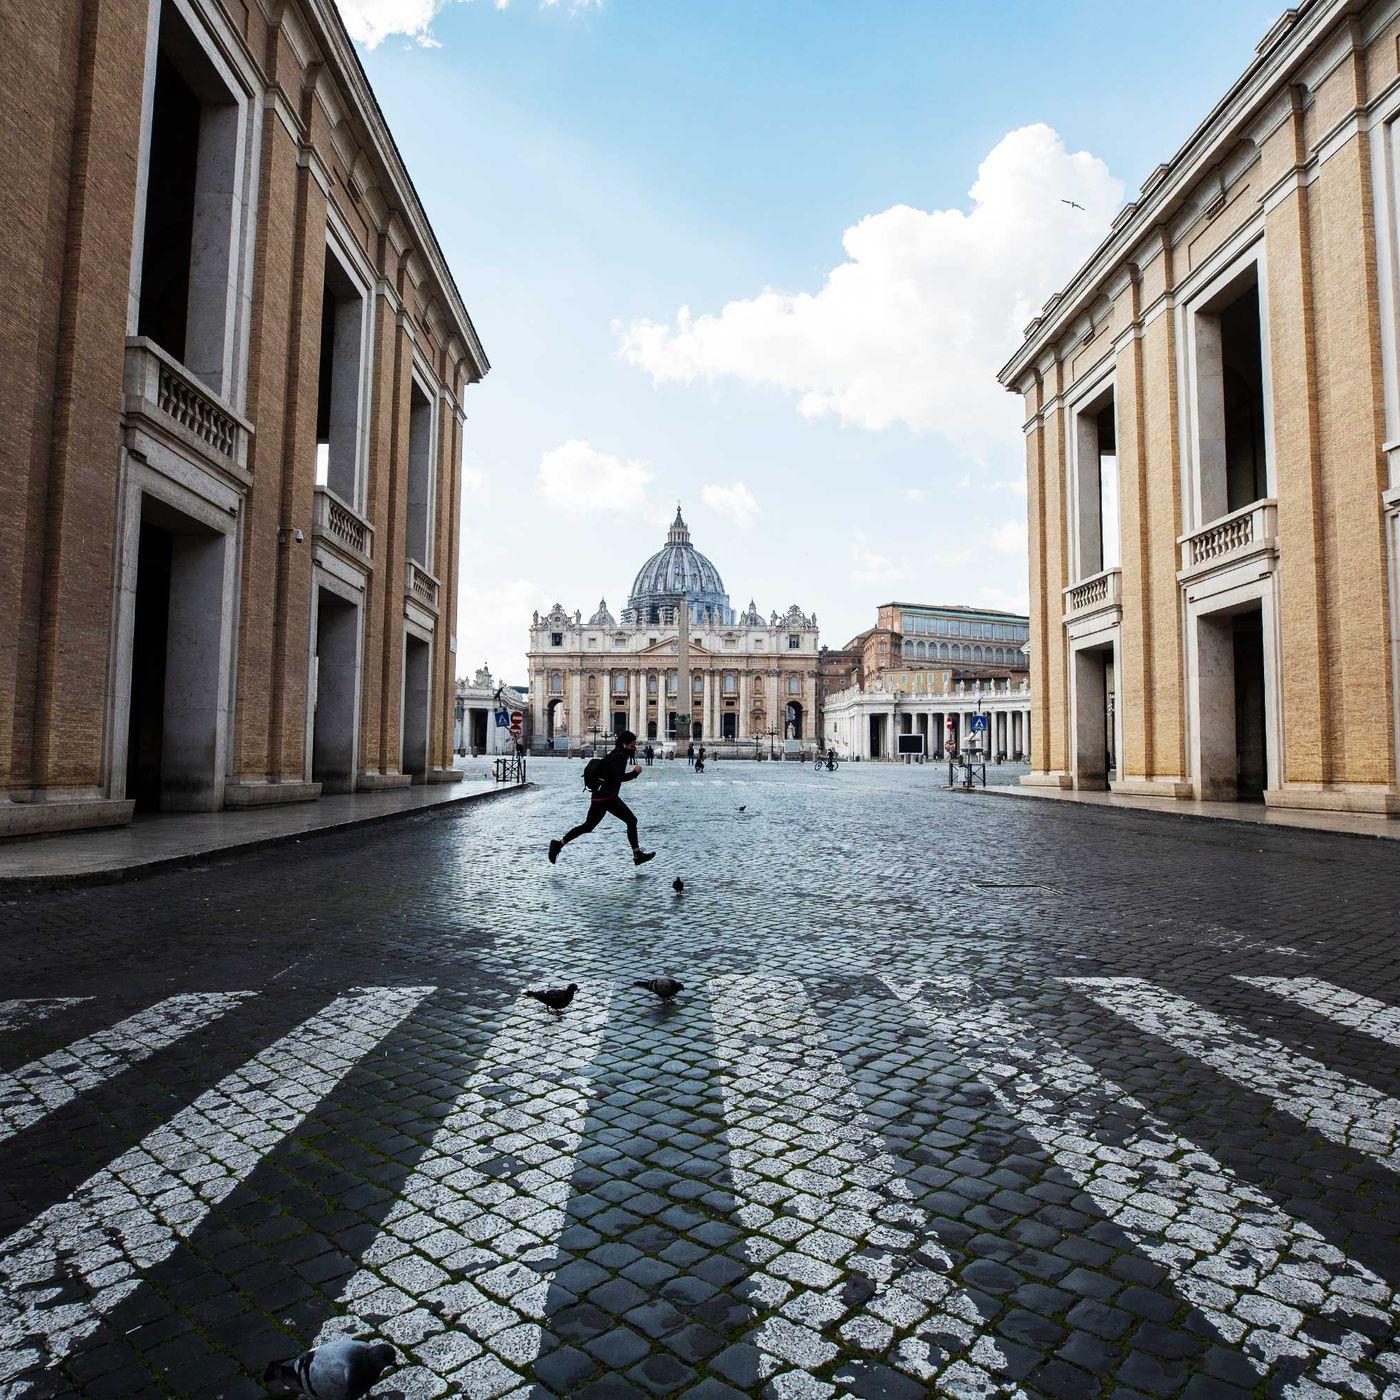 Life In Italy Under Full Coronavirus Lockdown Each City Is A Ghost City Vox